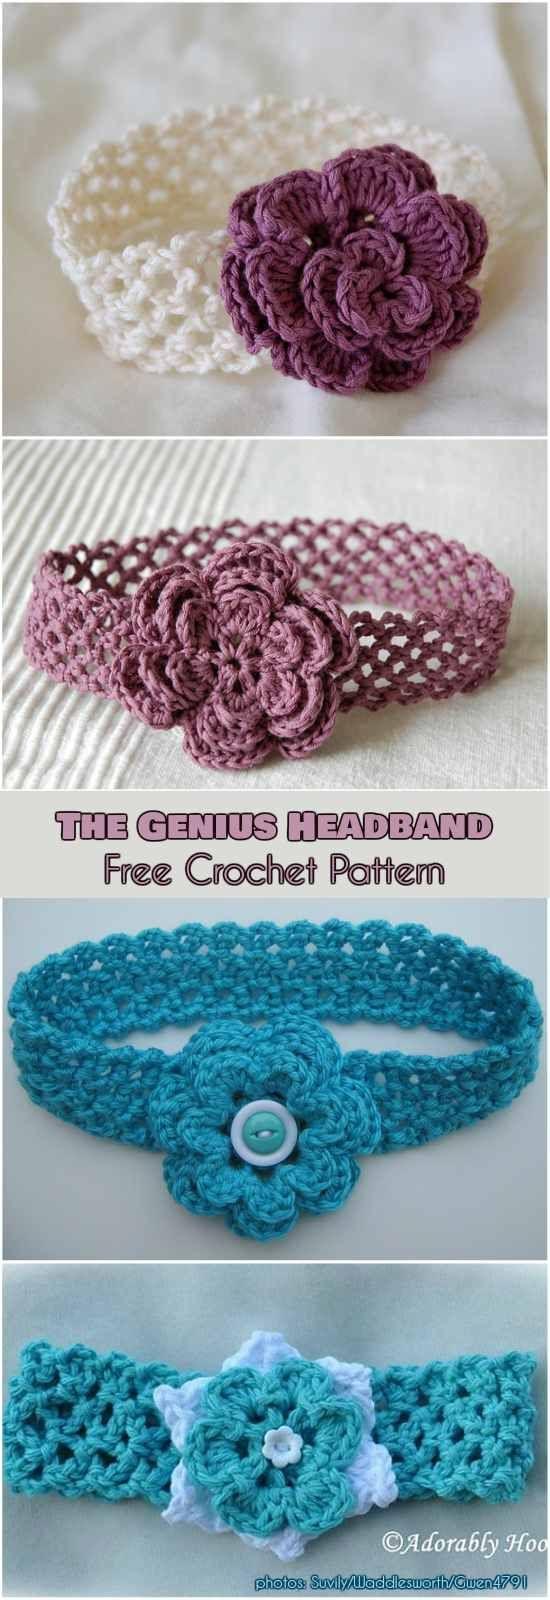 The Genius Headband with Flower Free Pattern